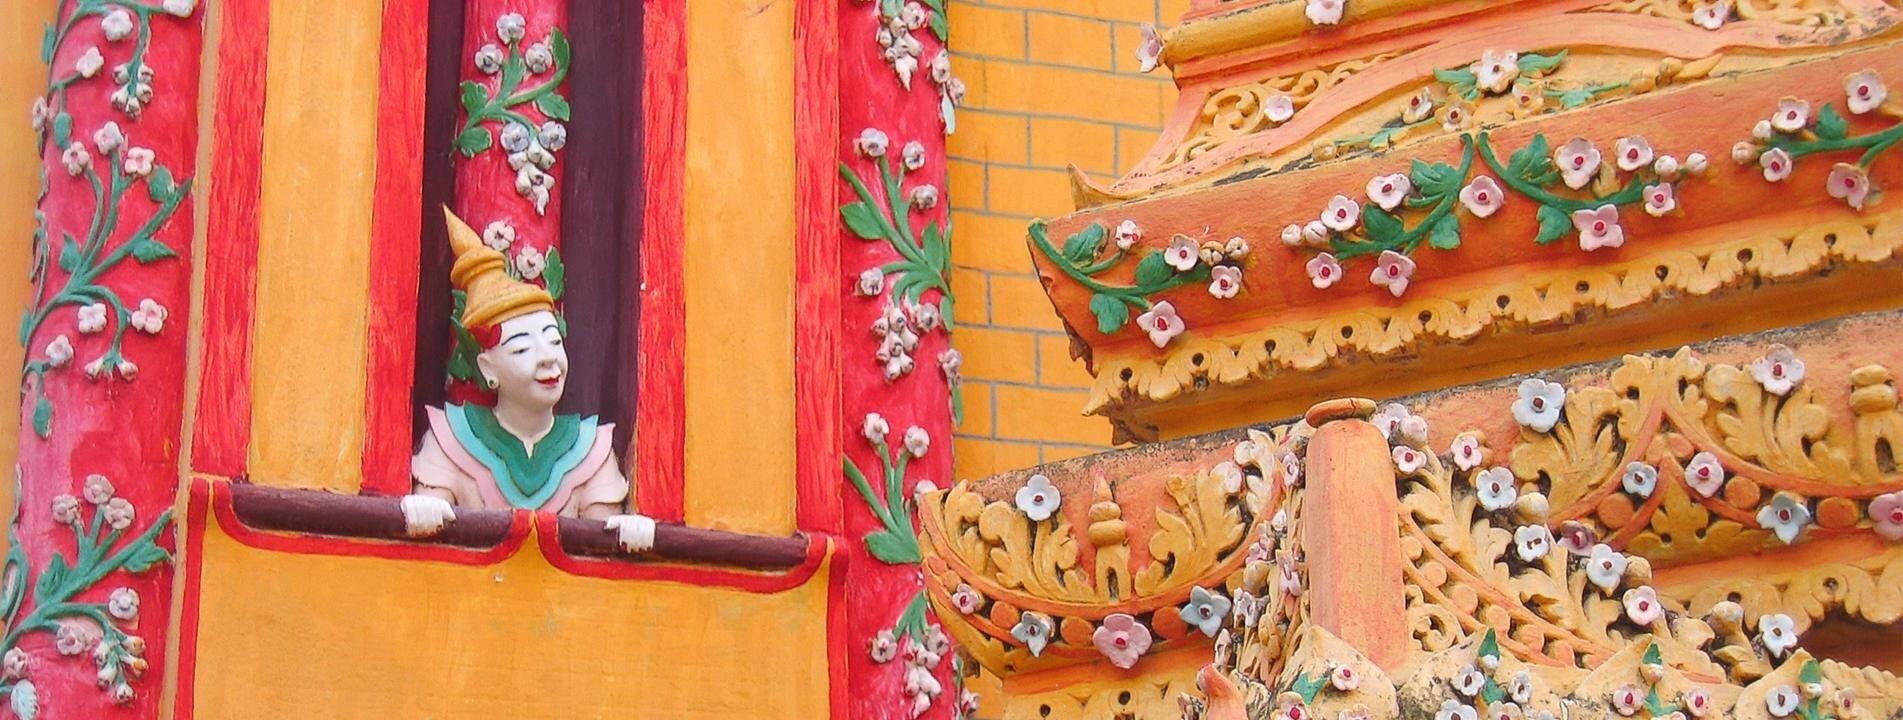 Brightly-colored Thanboddhay Pagoda in Monywa